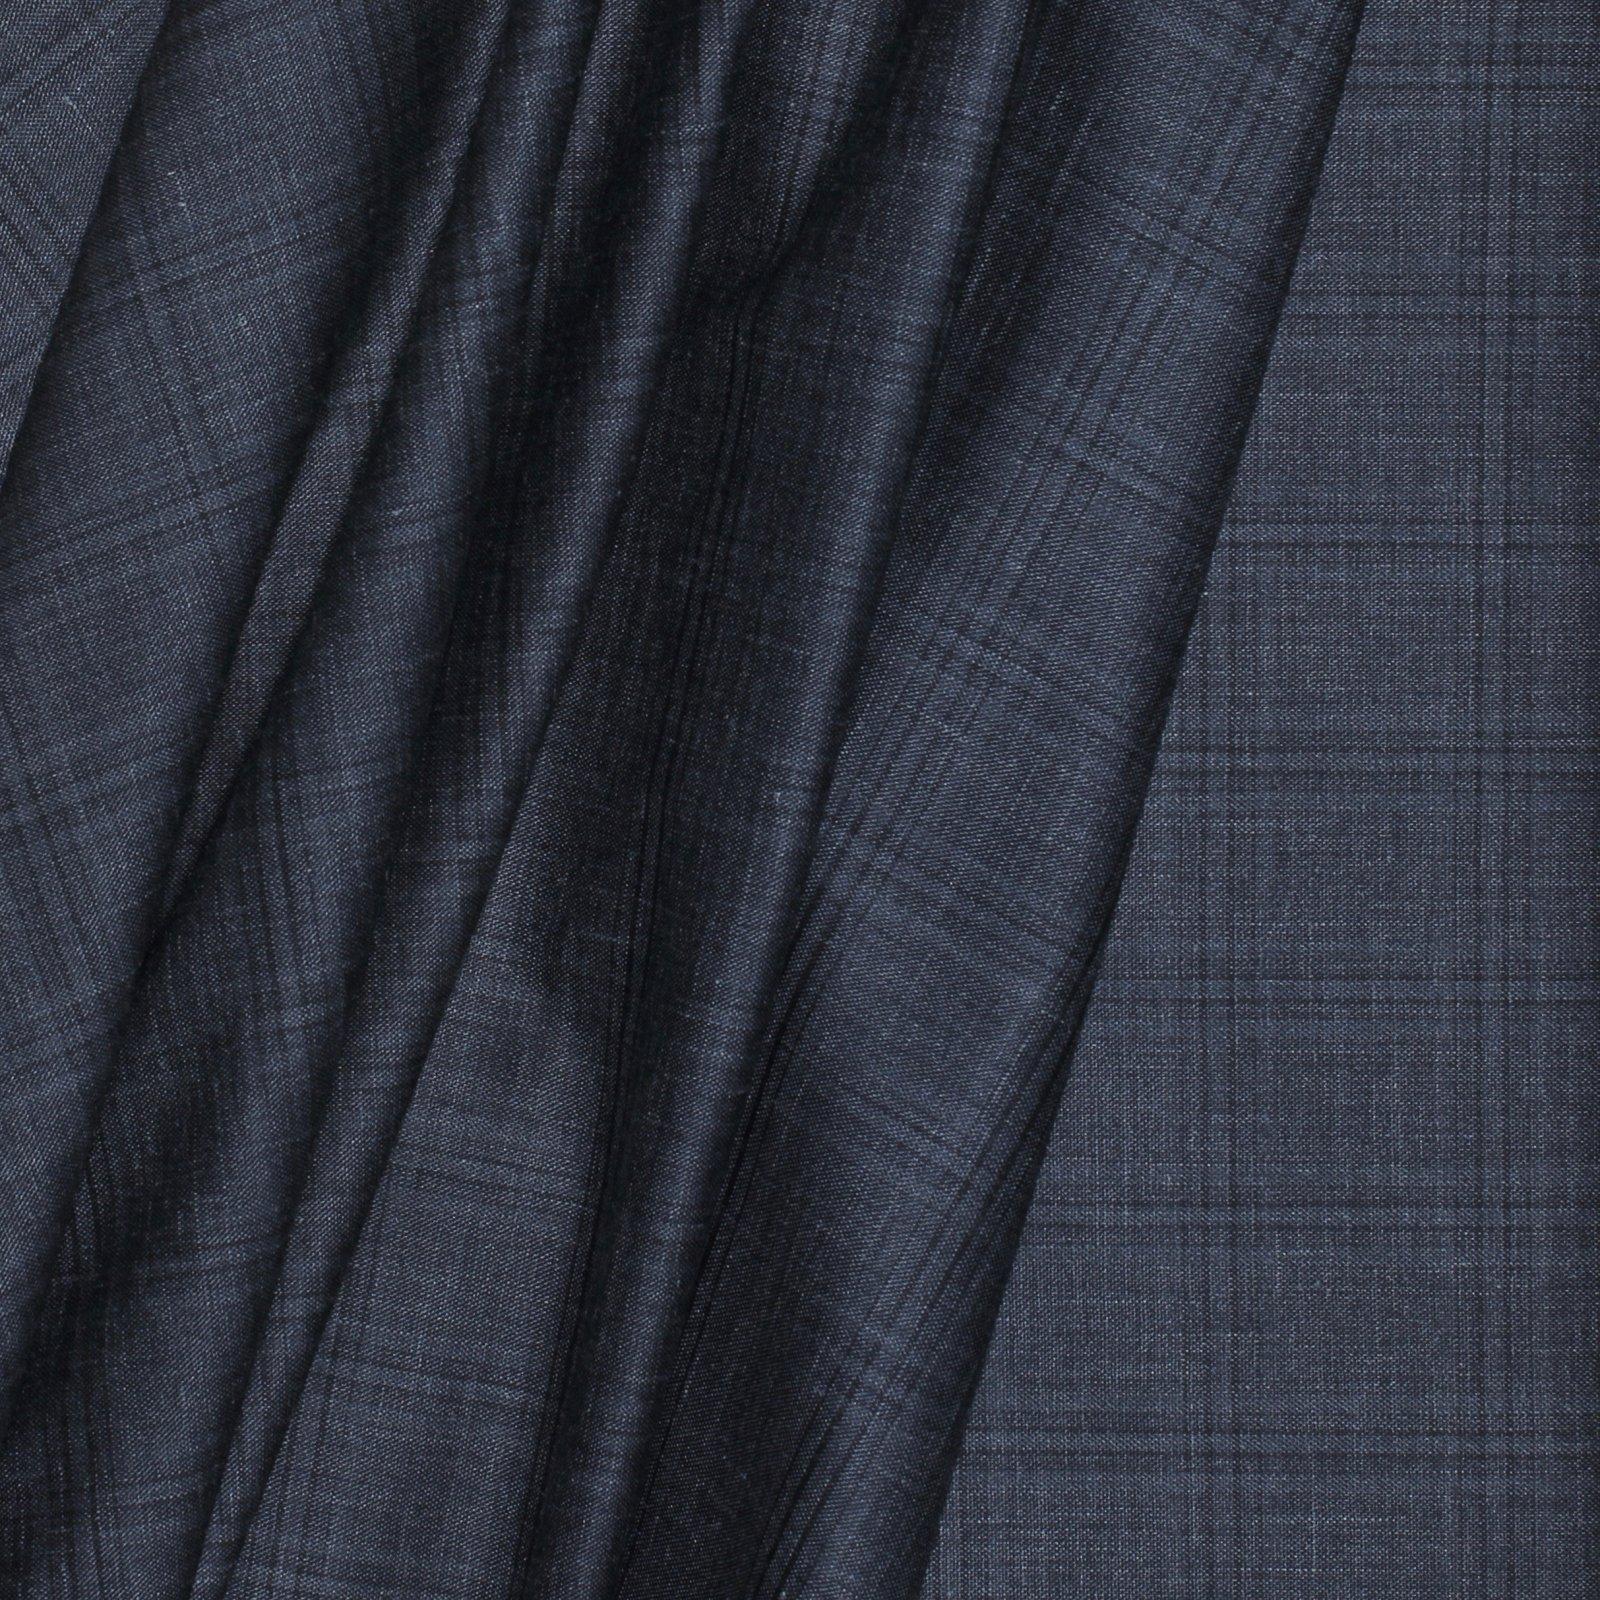 Charcoal Grey Plaid Wool/Linen/Silk Italian Blend